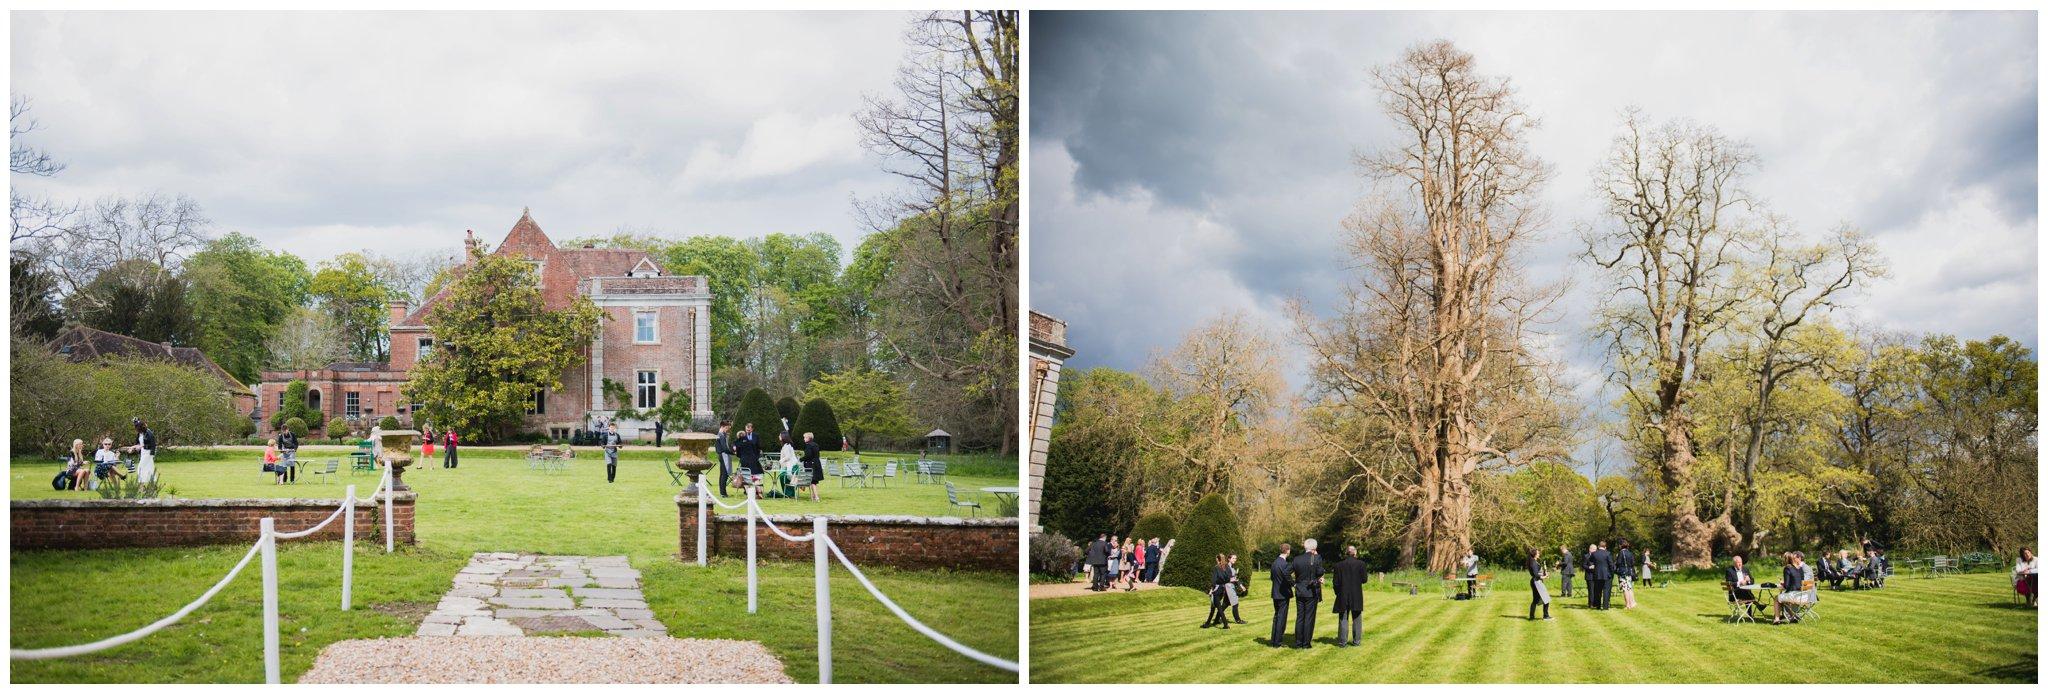 private country estate dorset wedding venue deans court wimborne